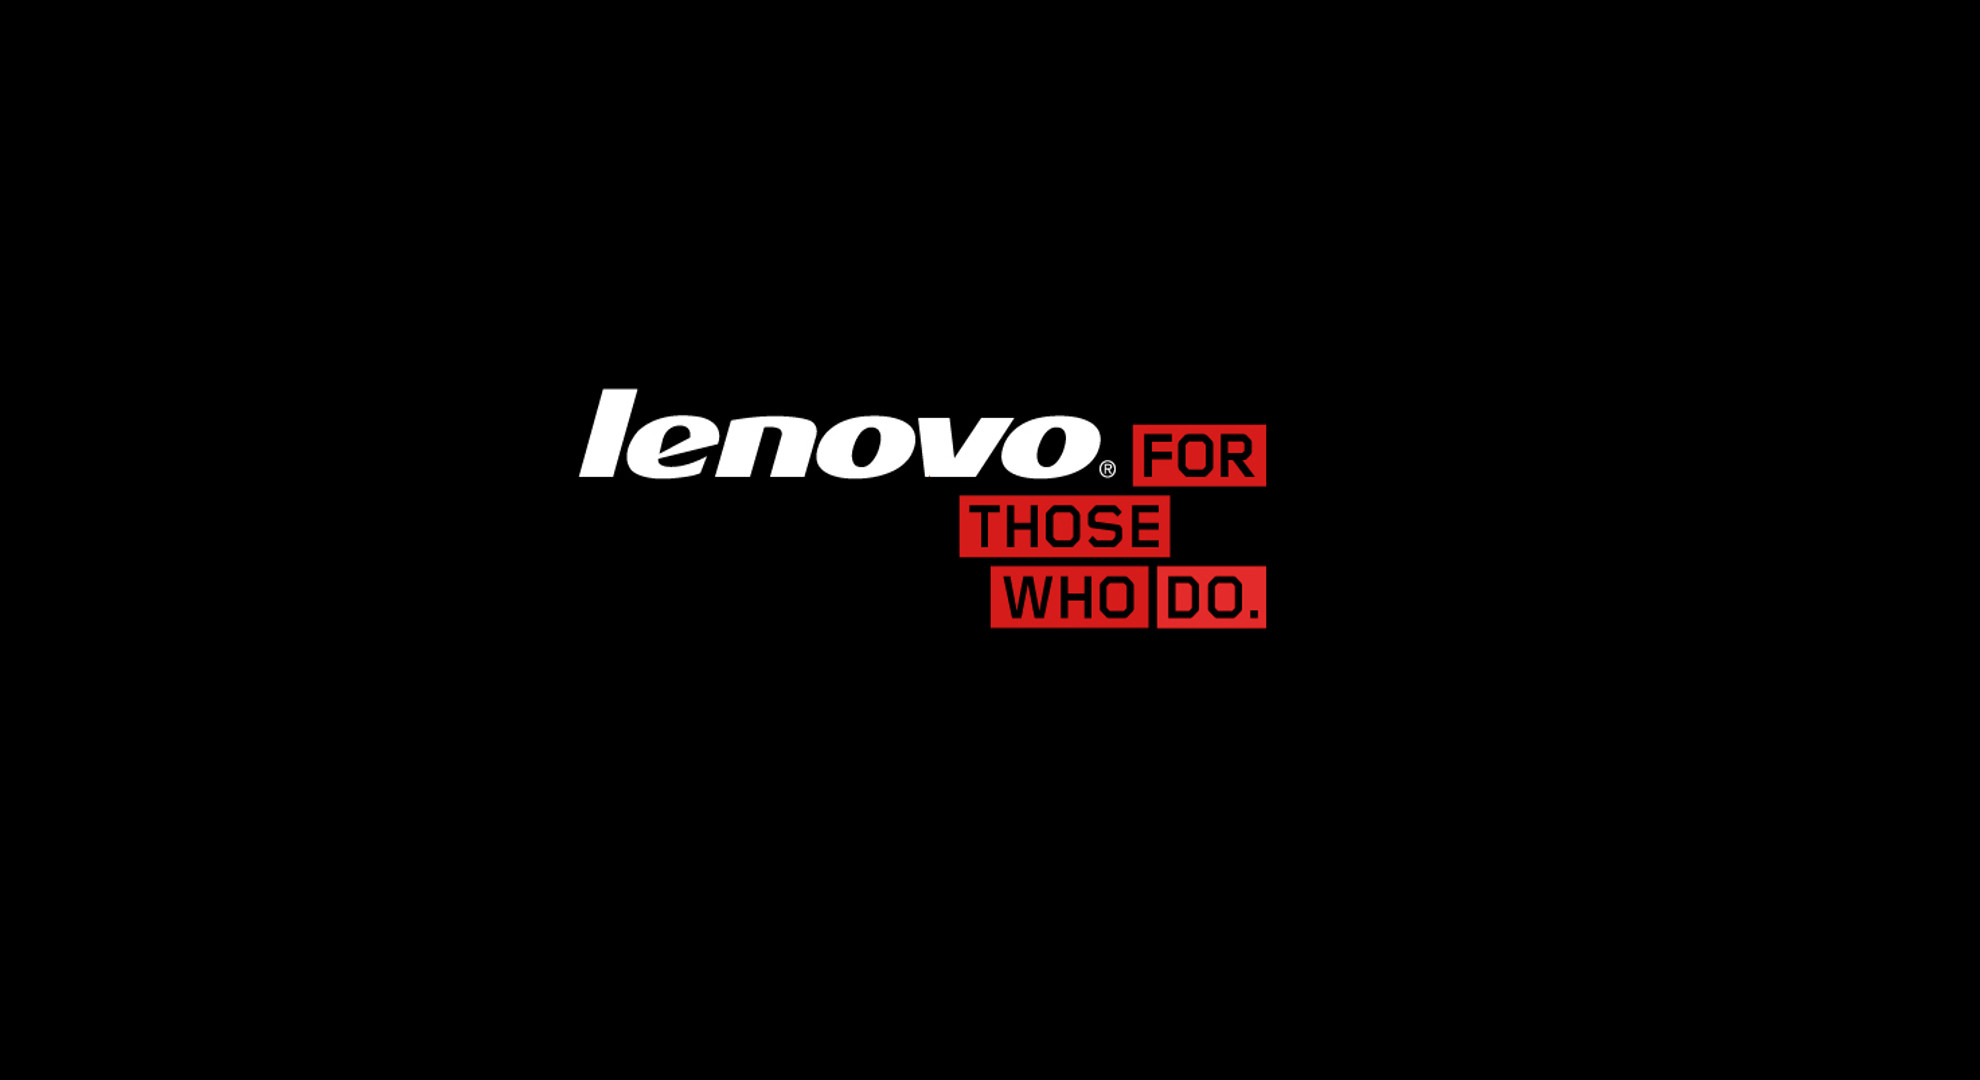 lenovo wallpaper 1366x768 68 images